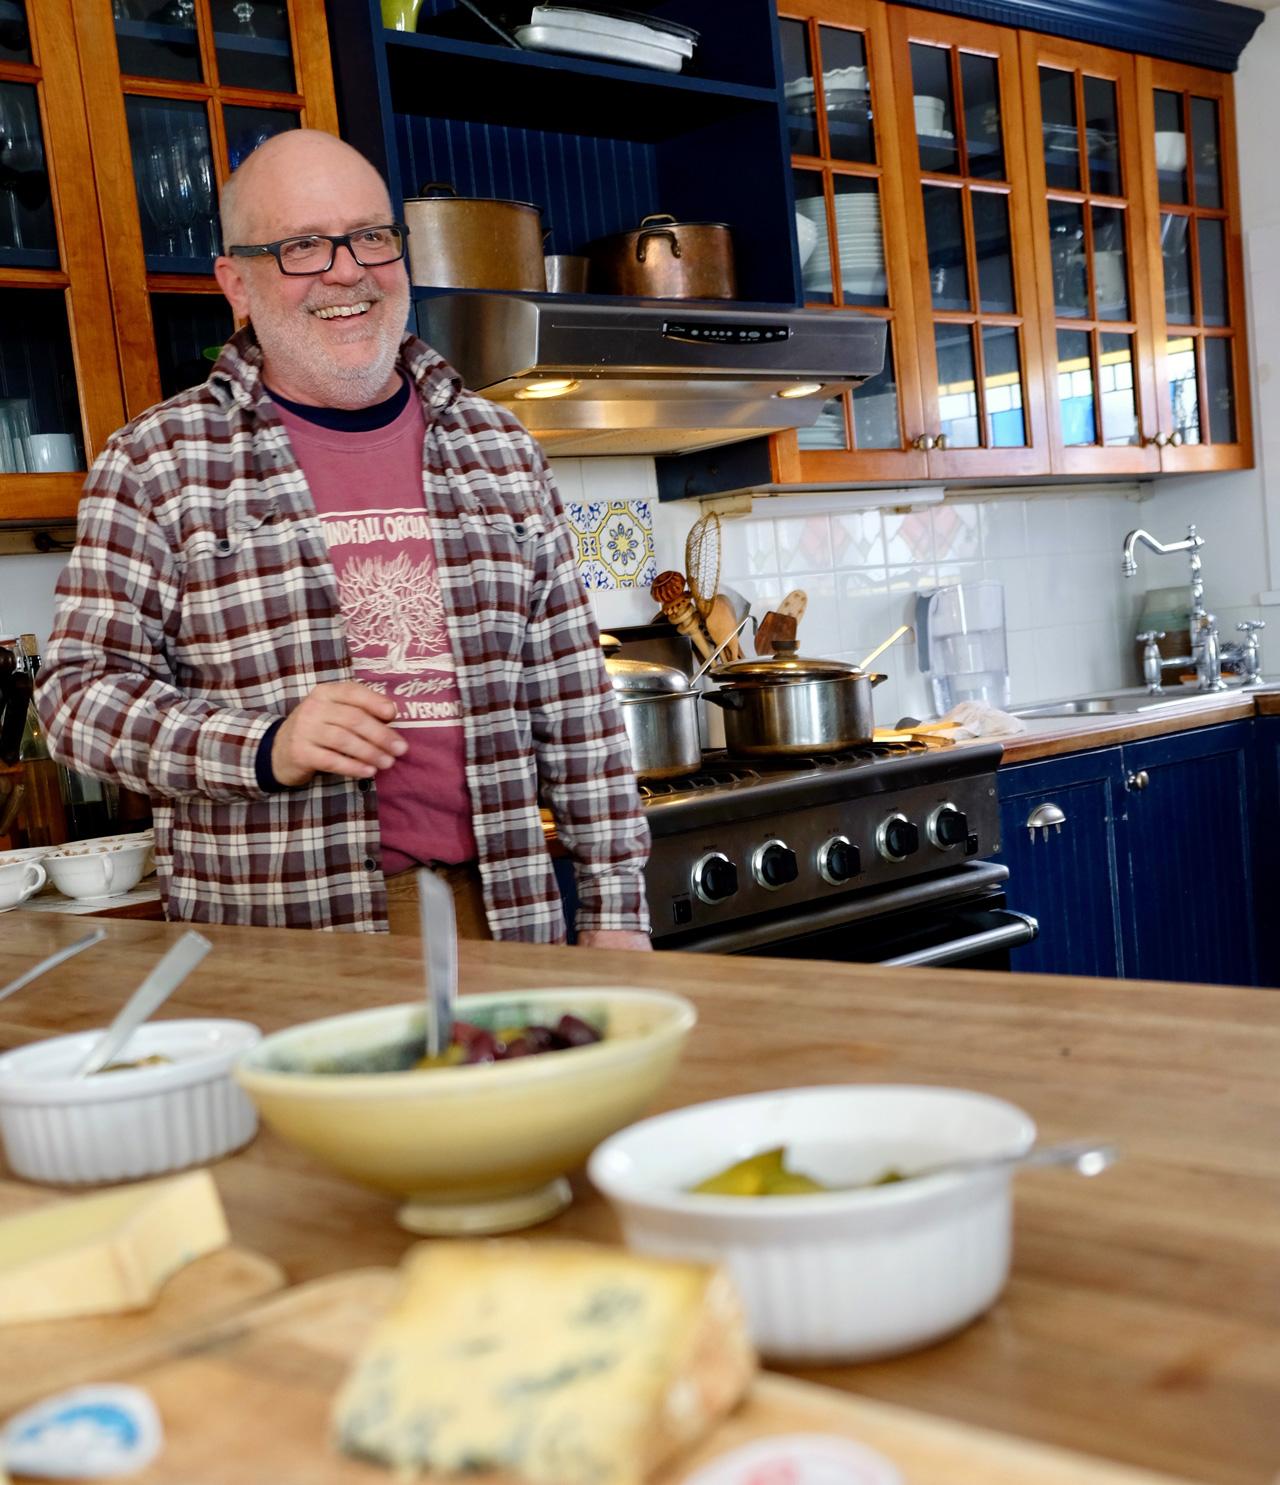 Brad Koehler at home in his kitchen